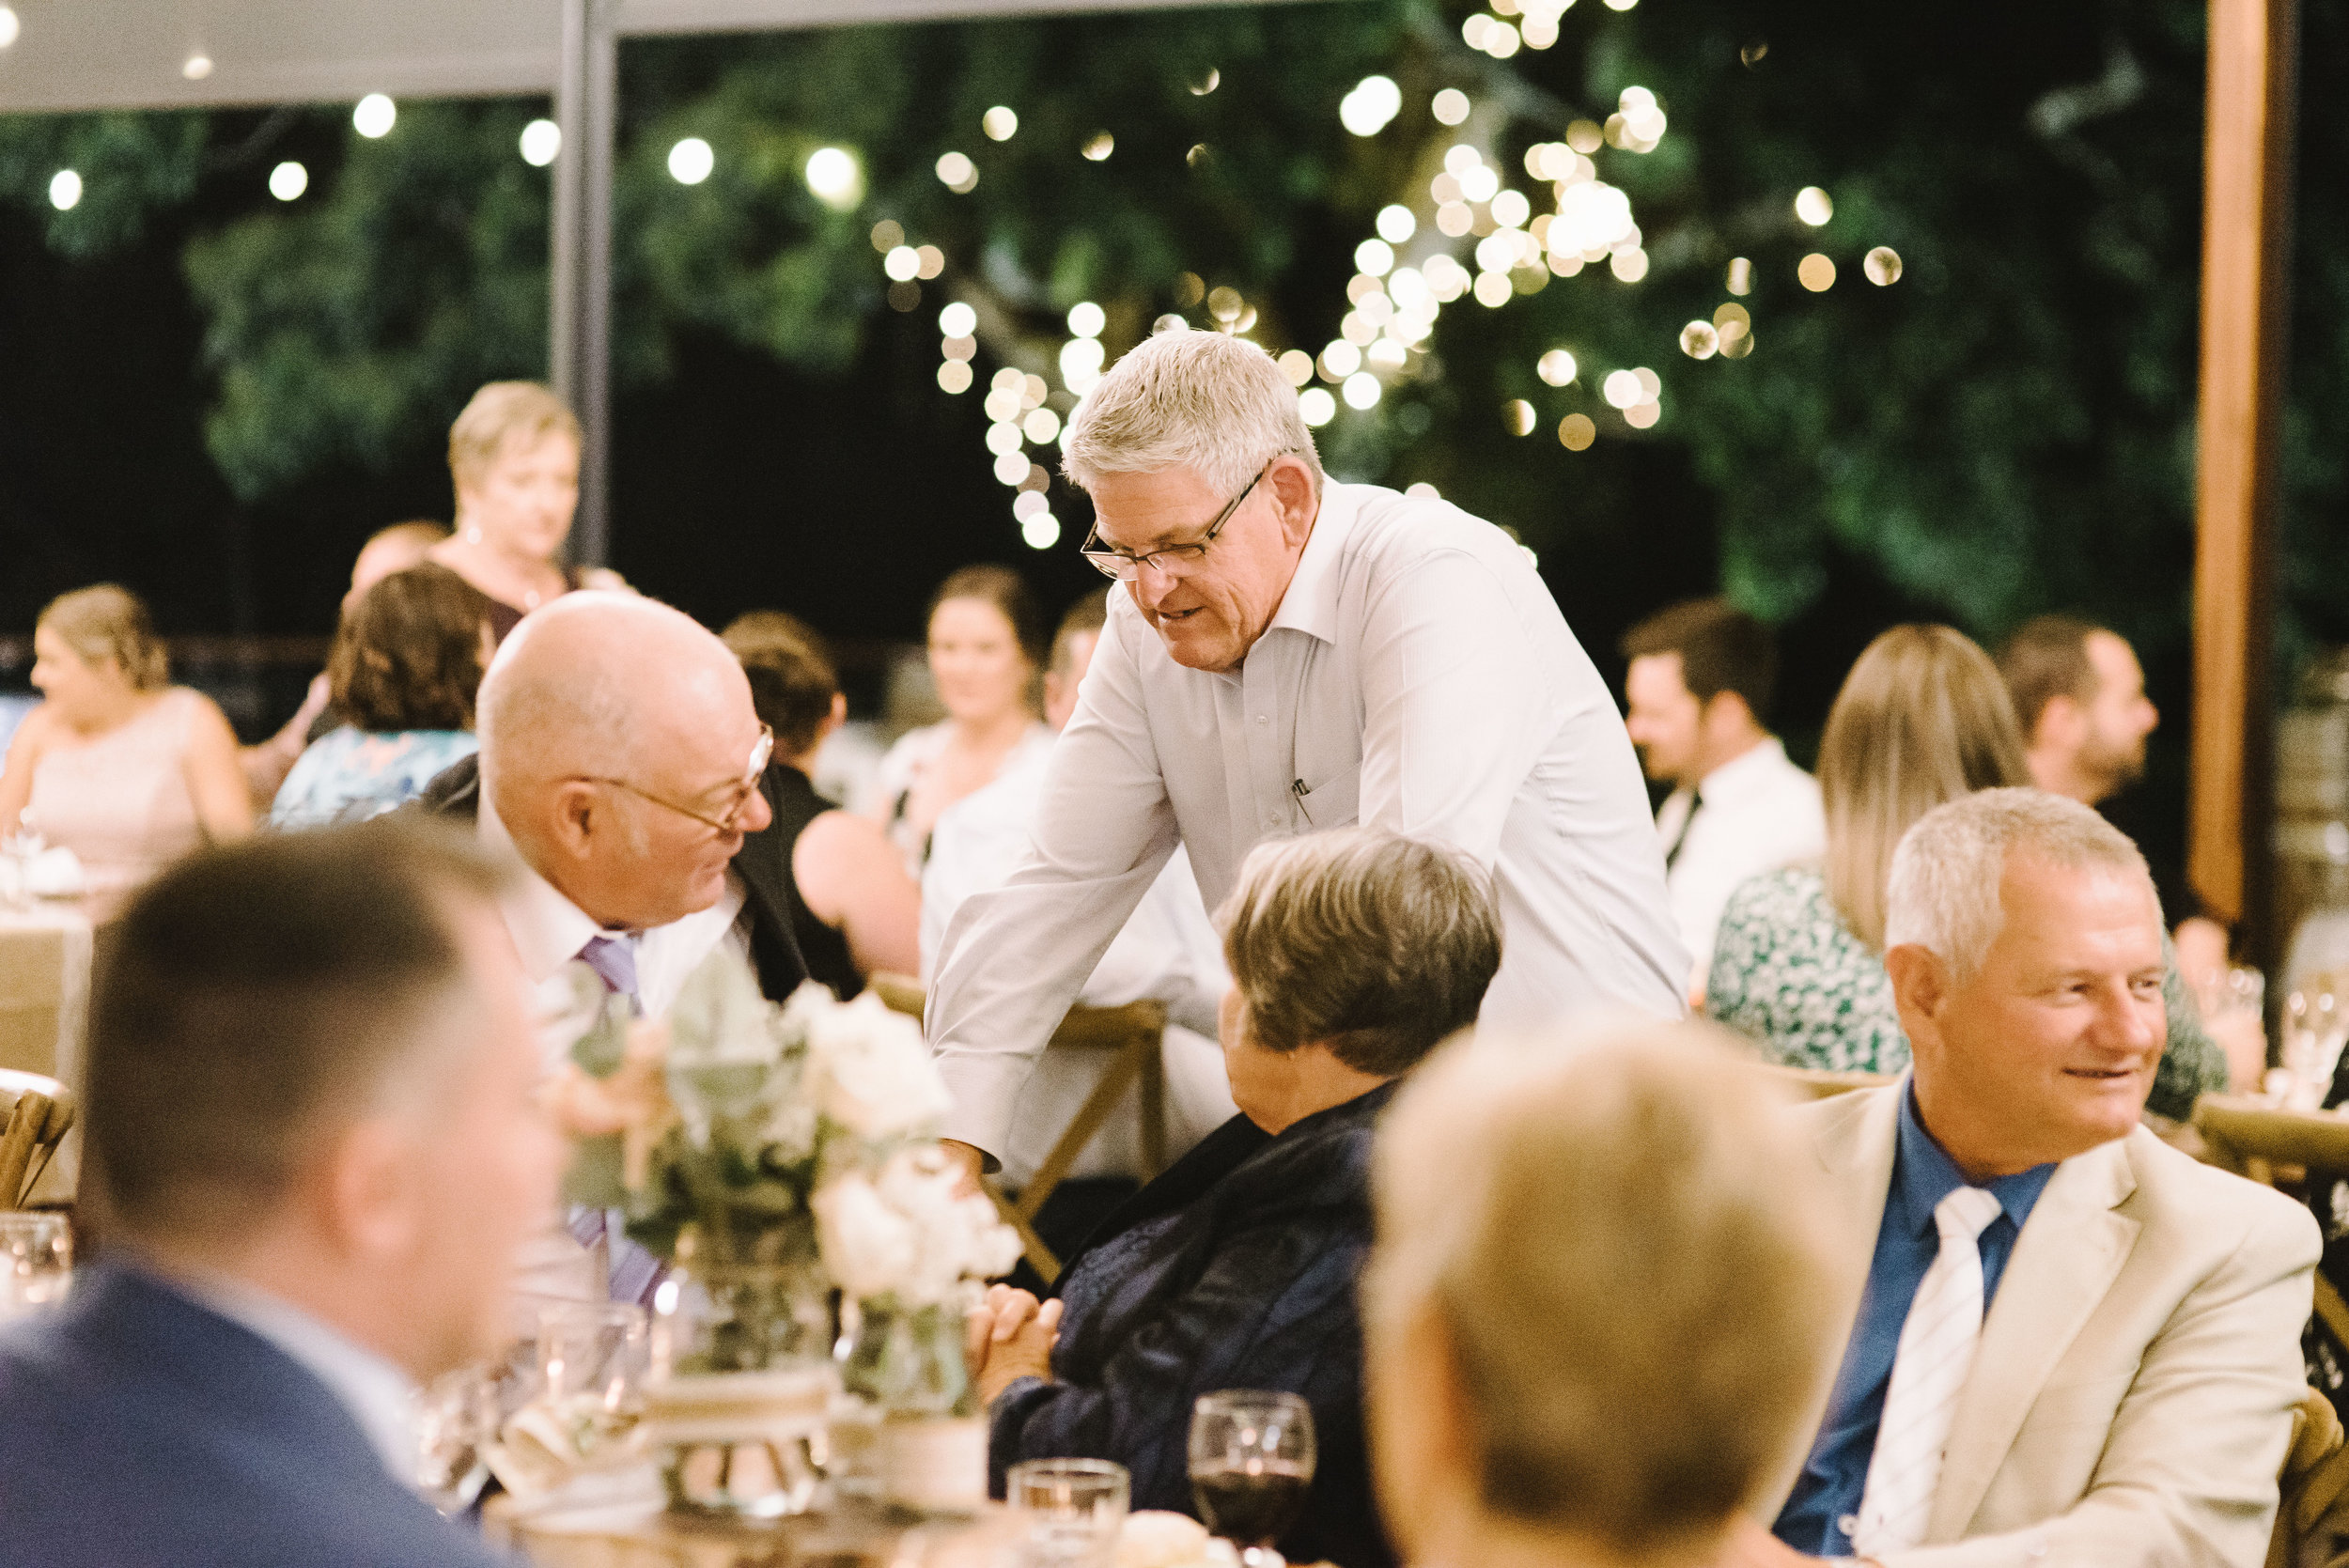 LAURENOLIVIA-austinvilla-estate-wedding-85.jpg